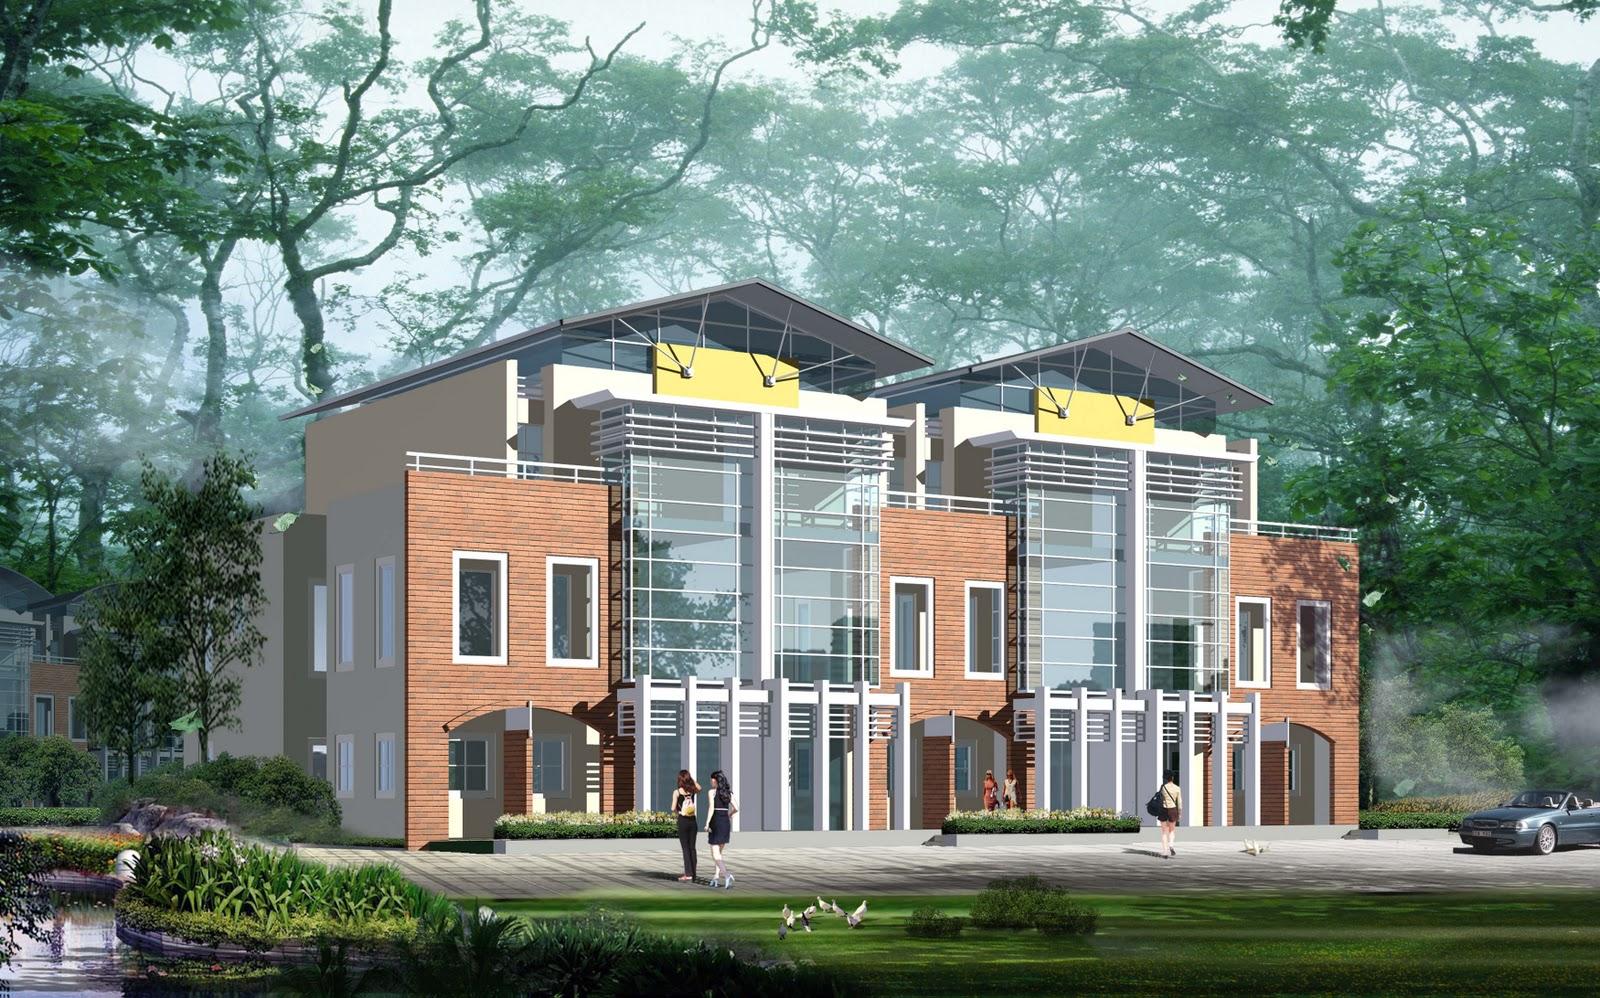 architectural%20scene%2010.jpg